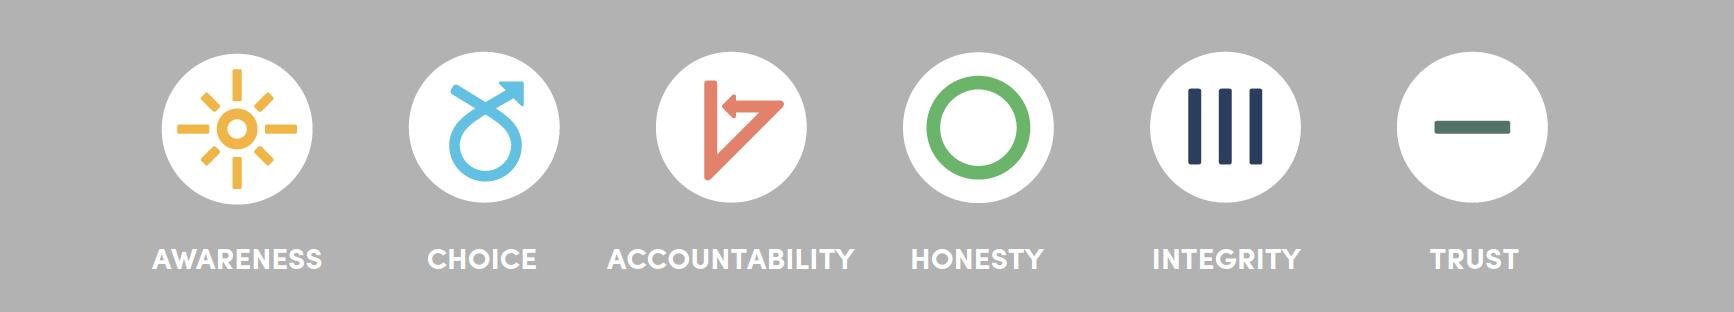 6 principles of high performance